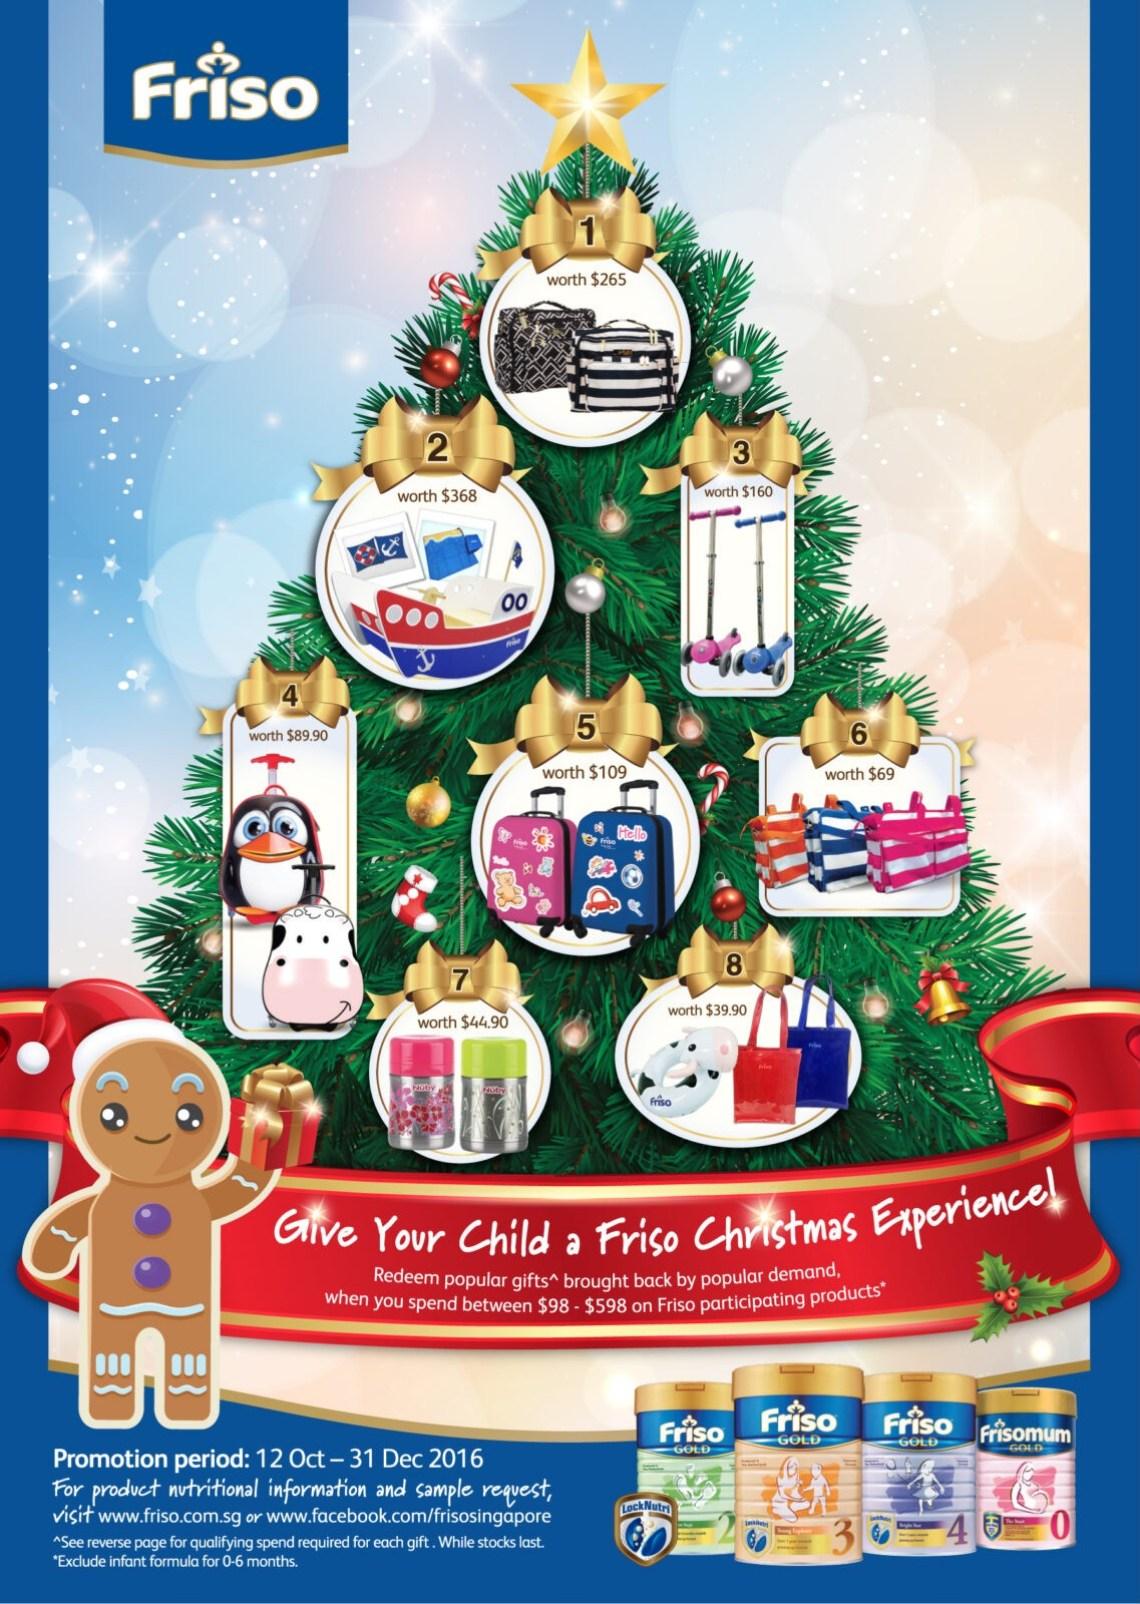 CS1126_Friso_Christmas_NCP 2016_ConForm_DFI_FAP